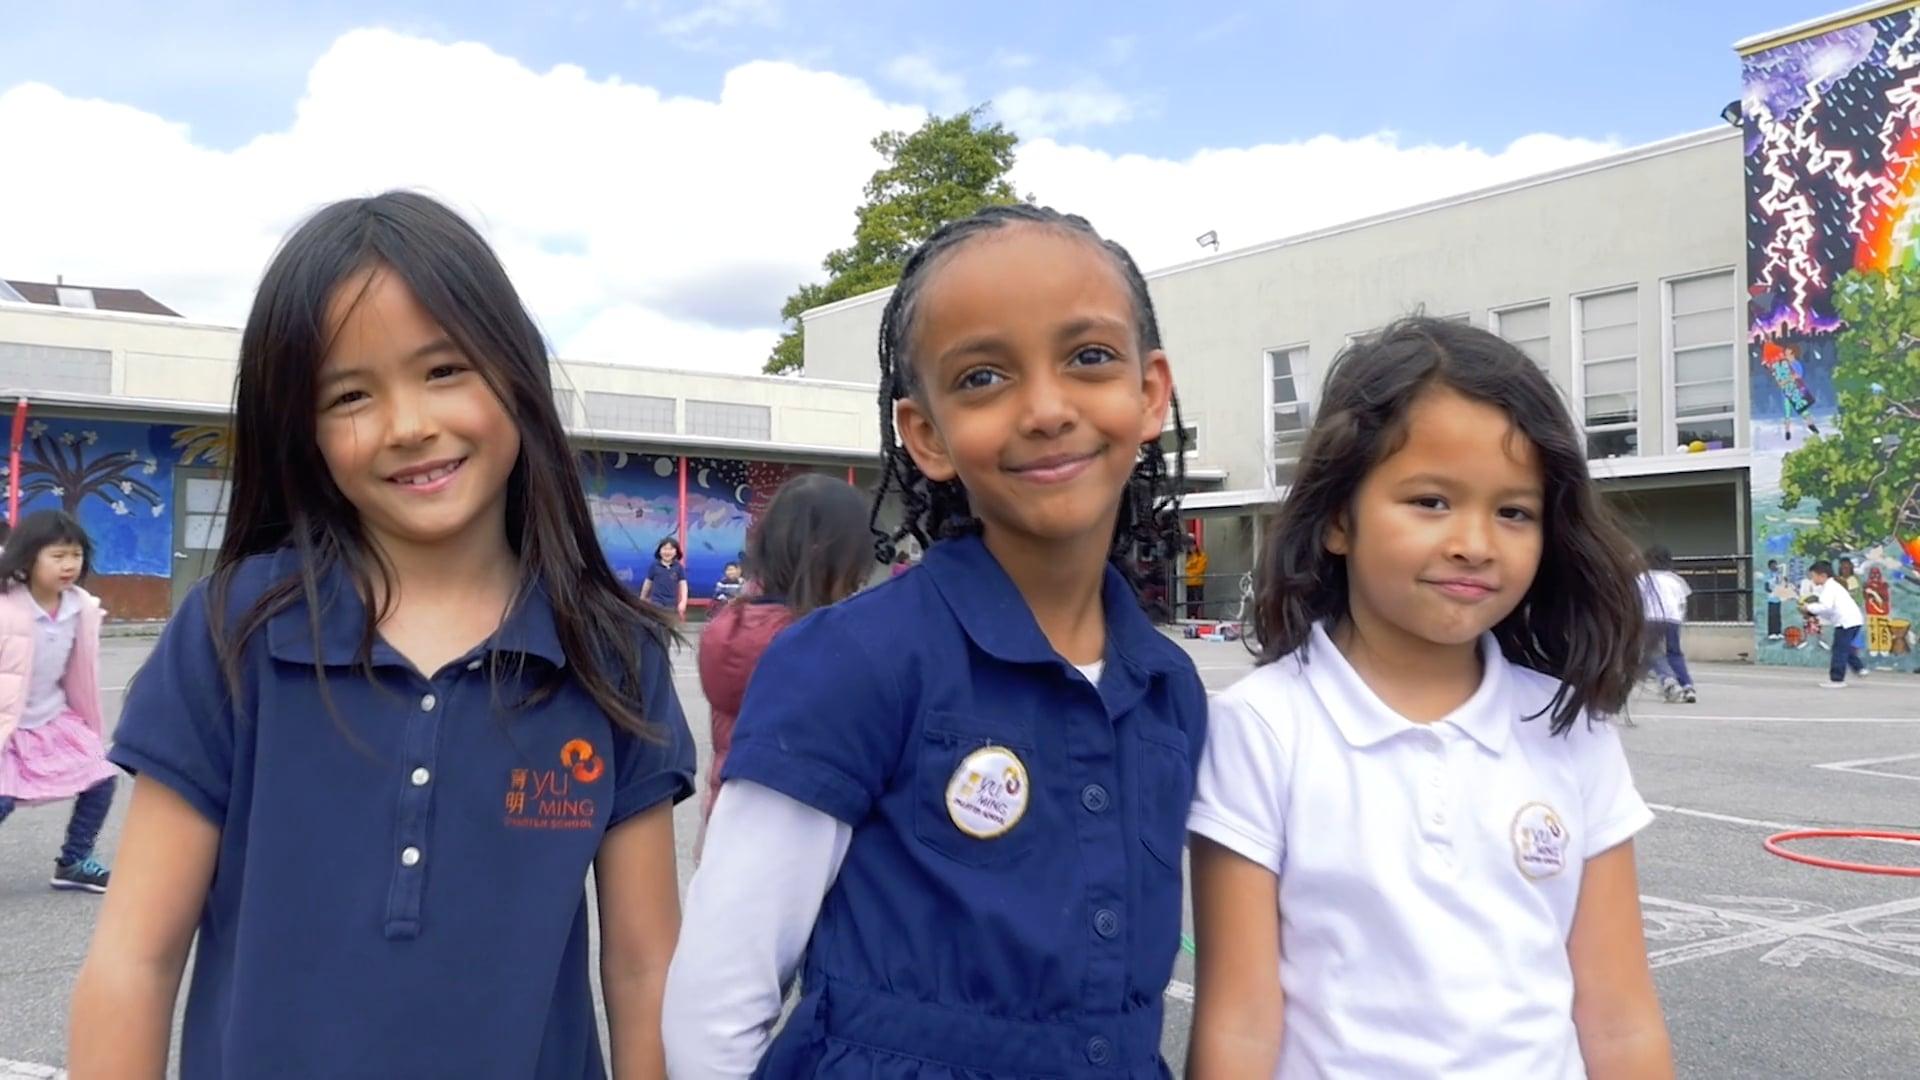 School Capital Campaign: Yu Ming Charter School